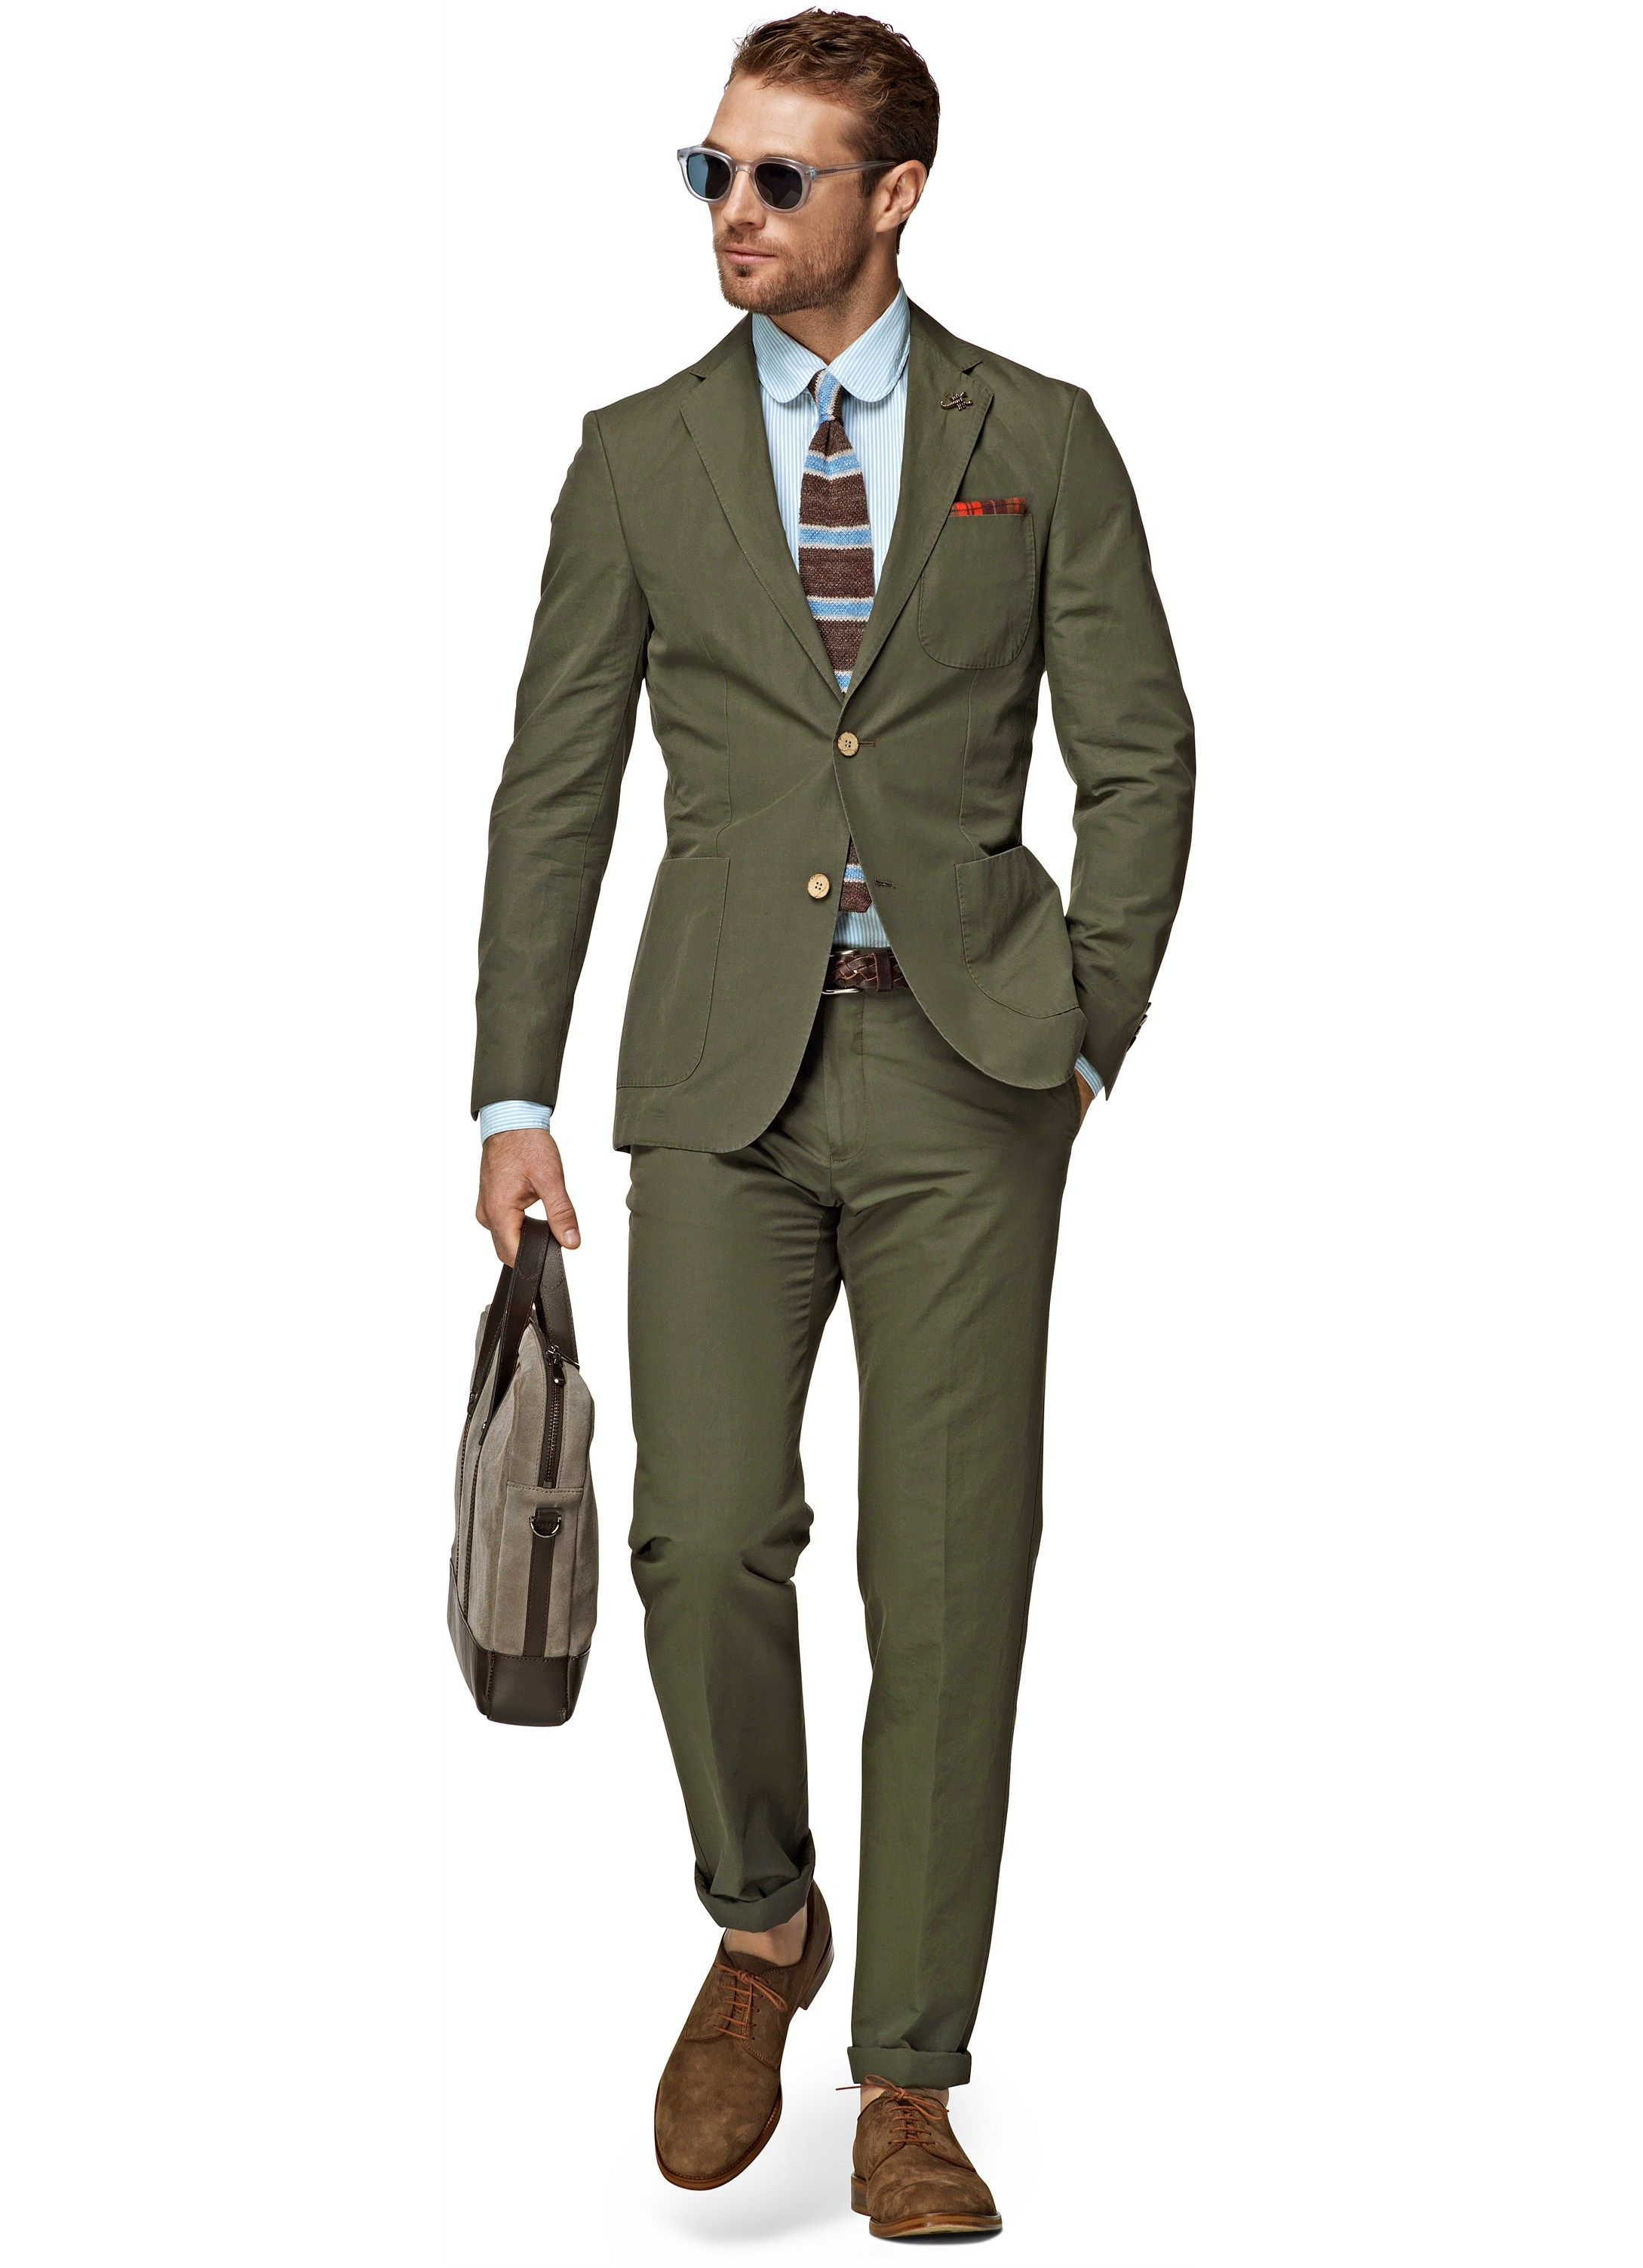 Suit Supply COPENHAGEN GREEN PLAIN | JBB2 / Style | Pinterest ...